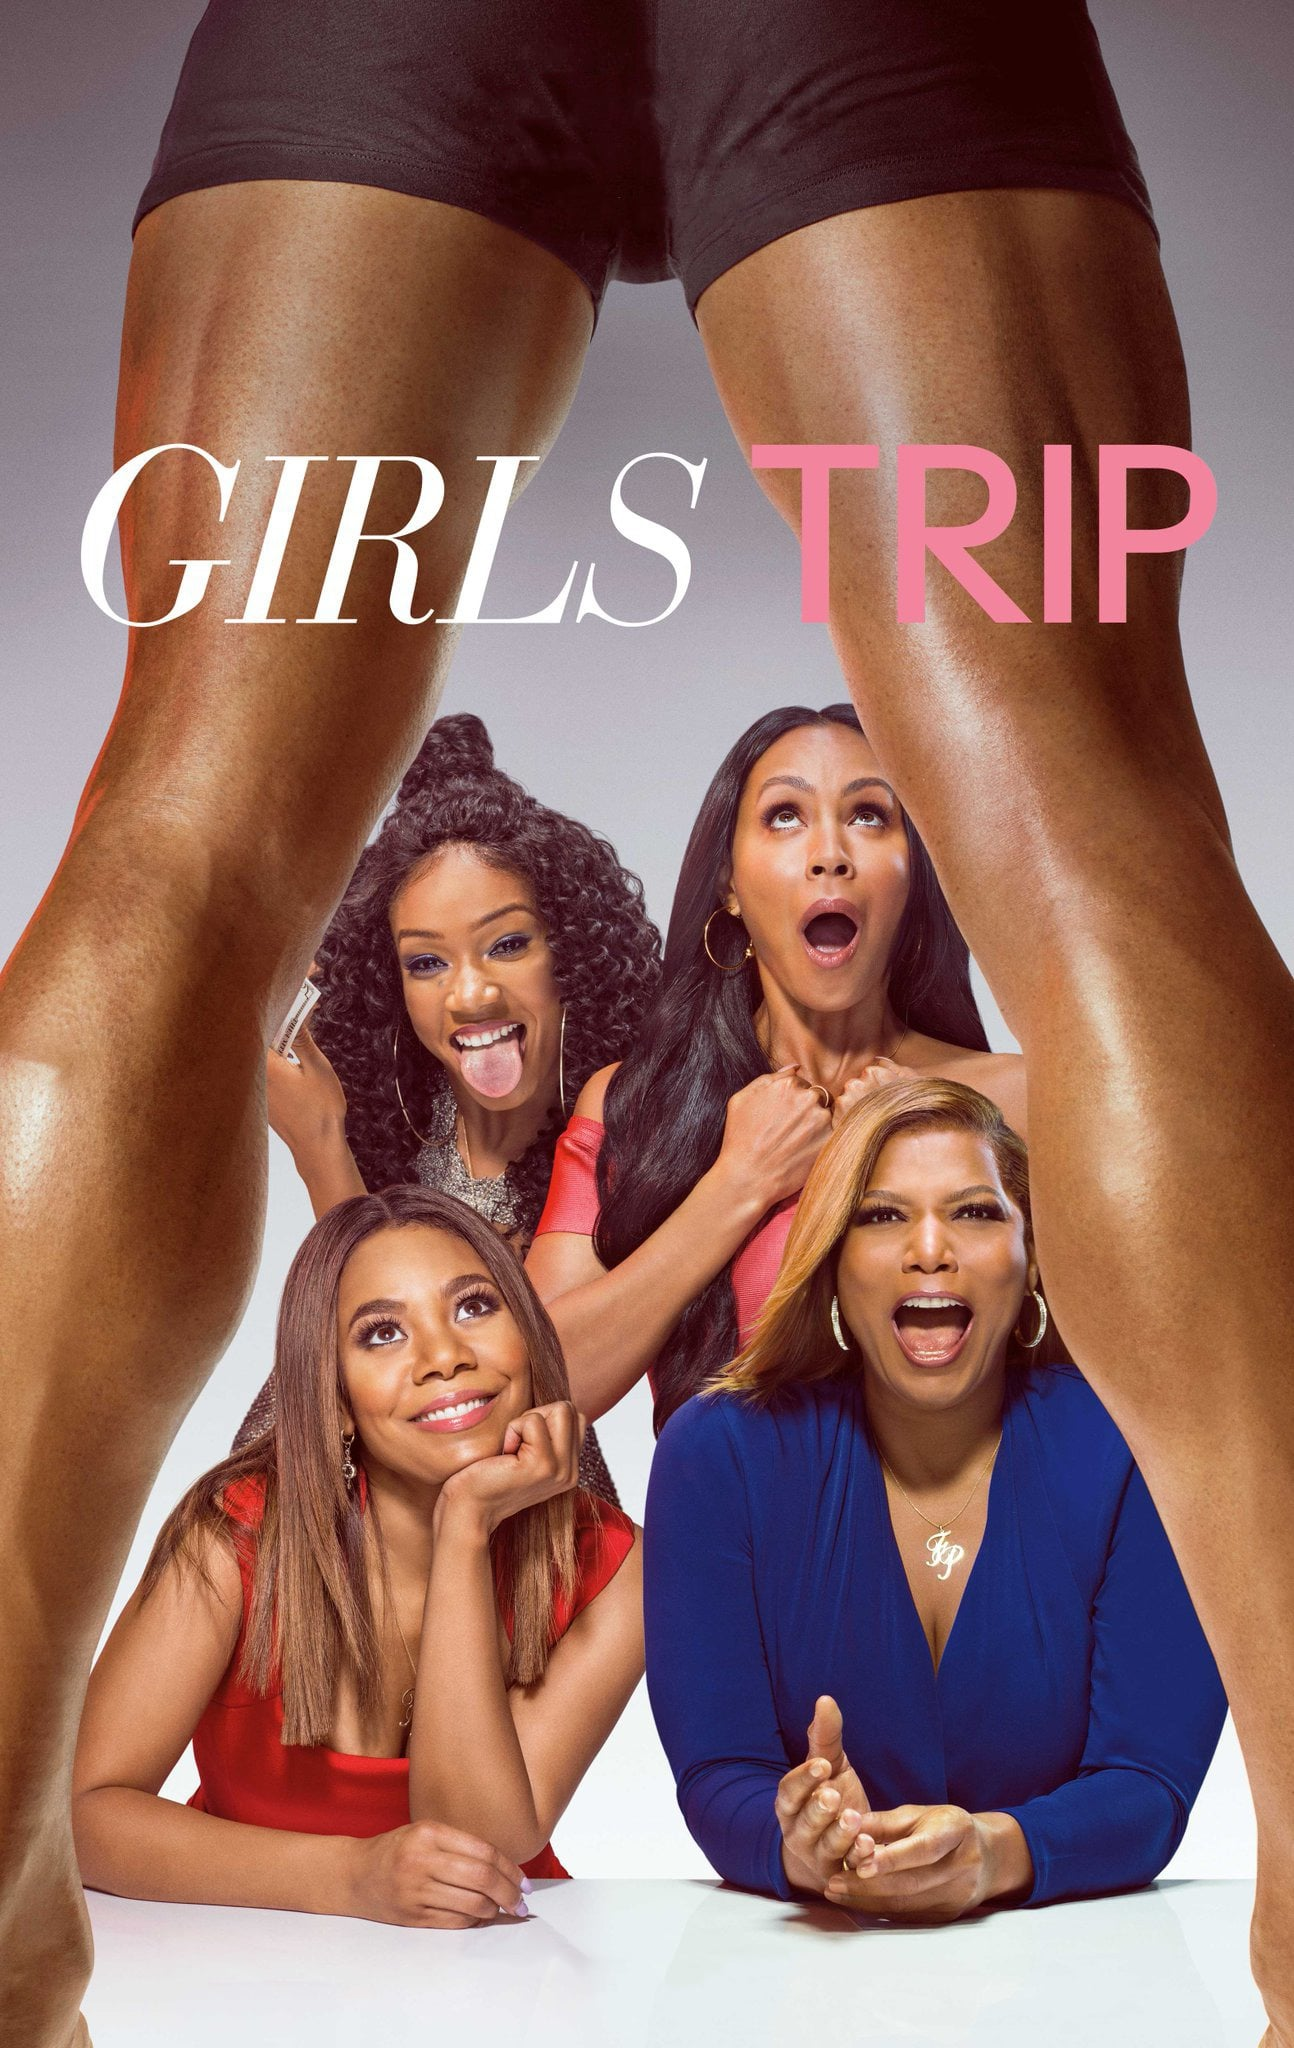 Girls Trip / Σαββατοκύριακο με τα Κορίτσια